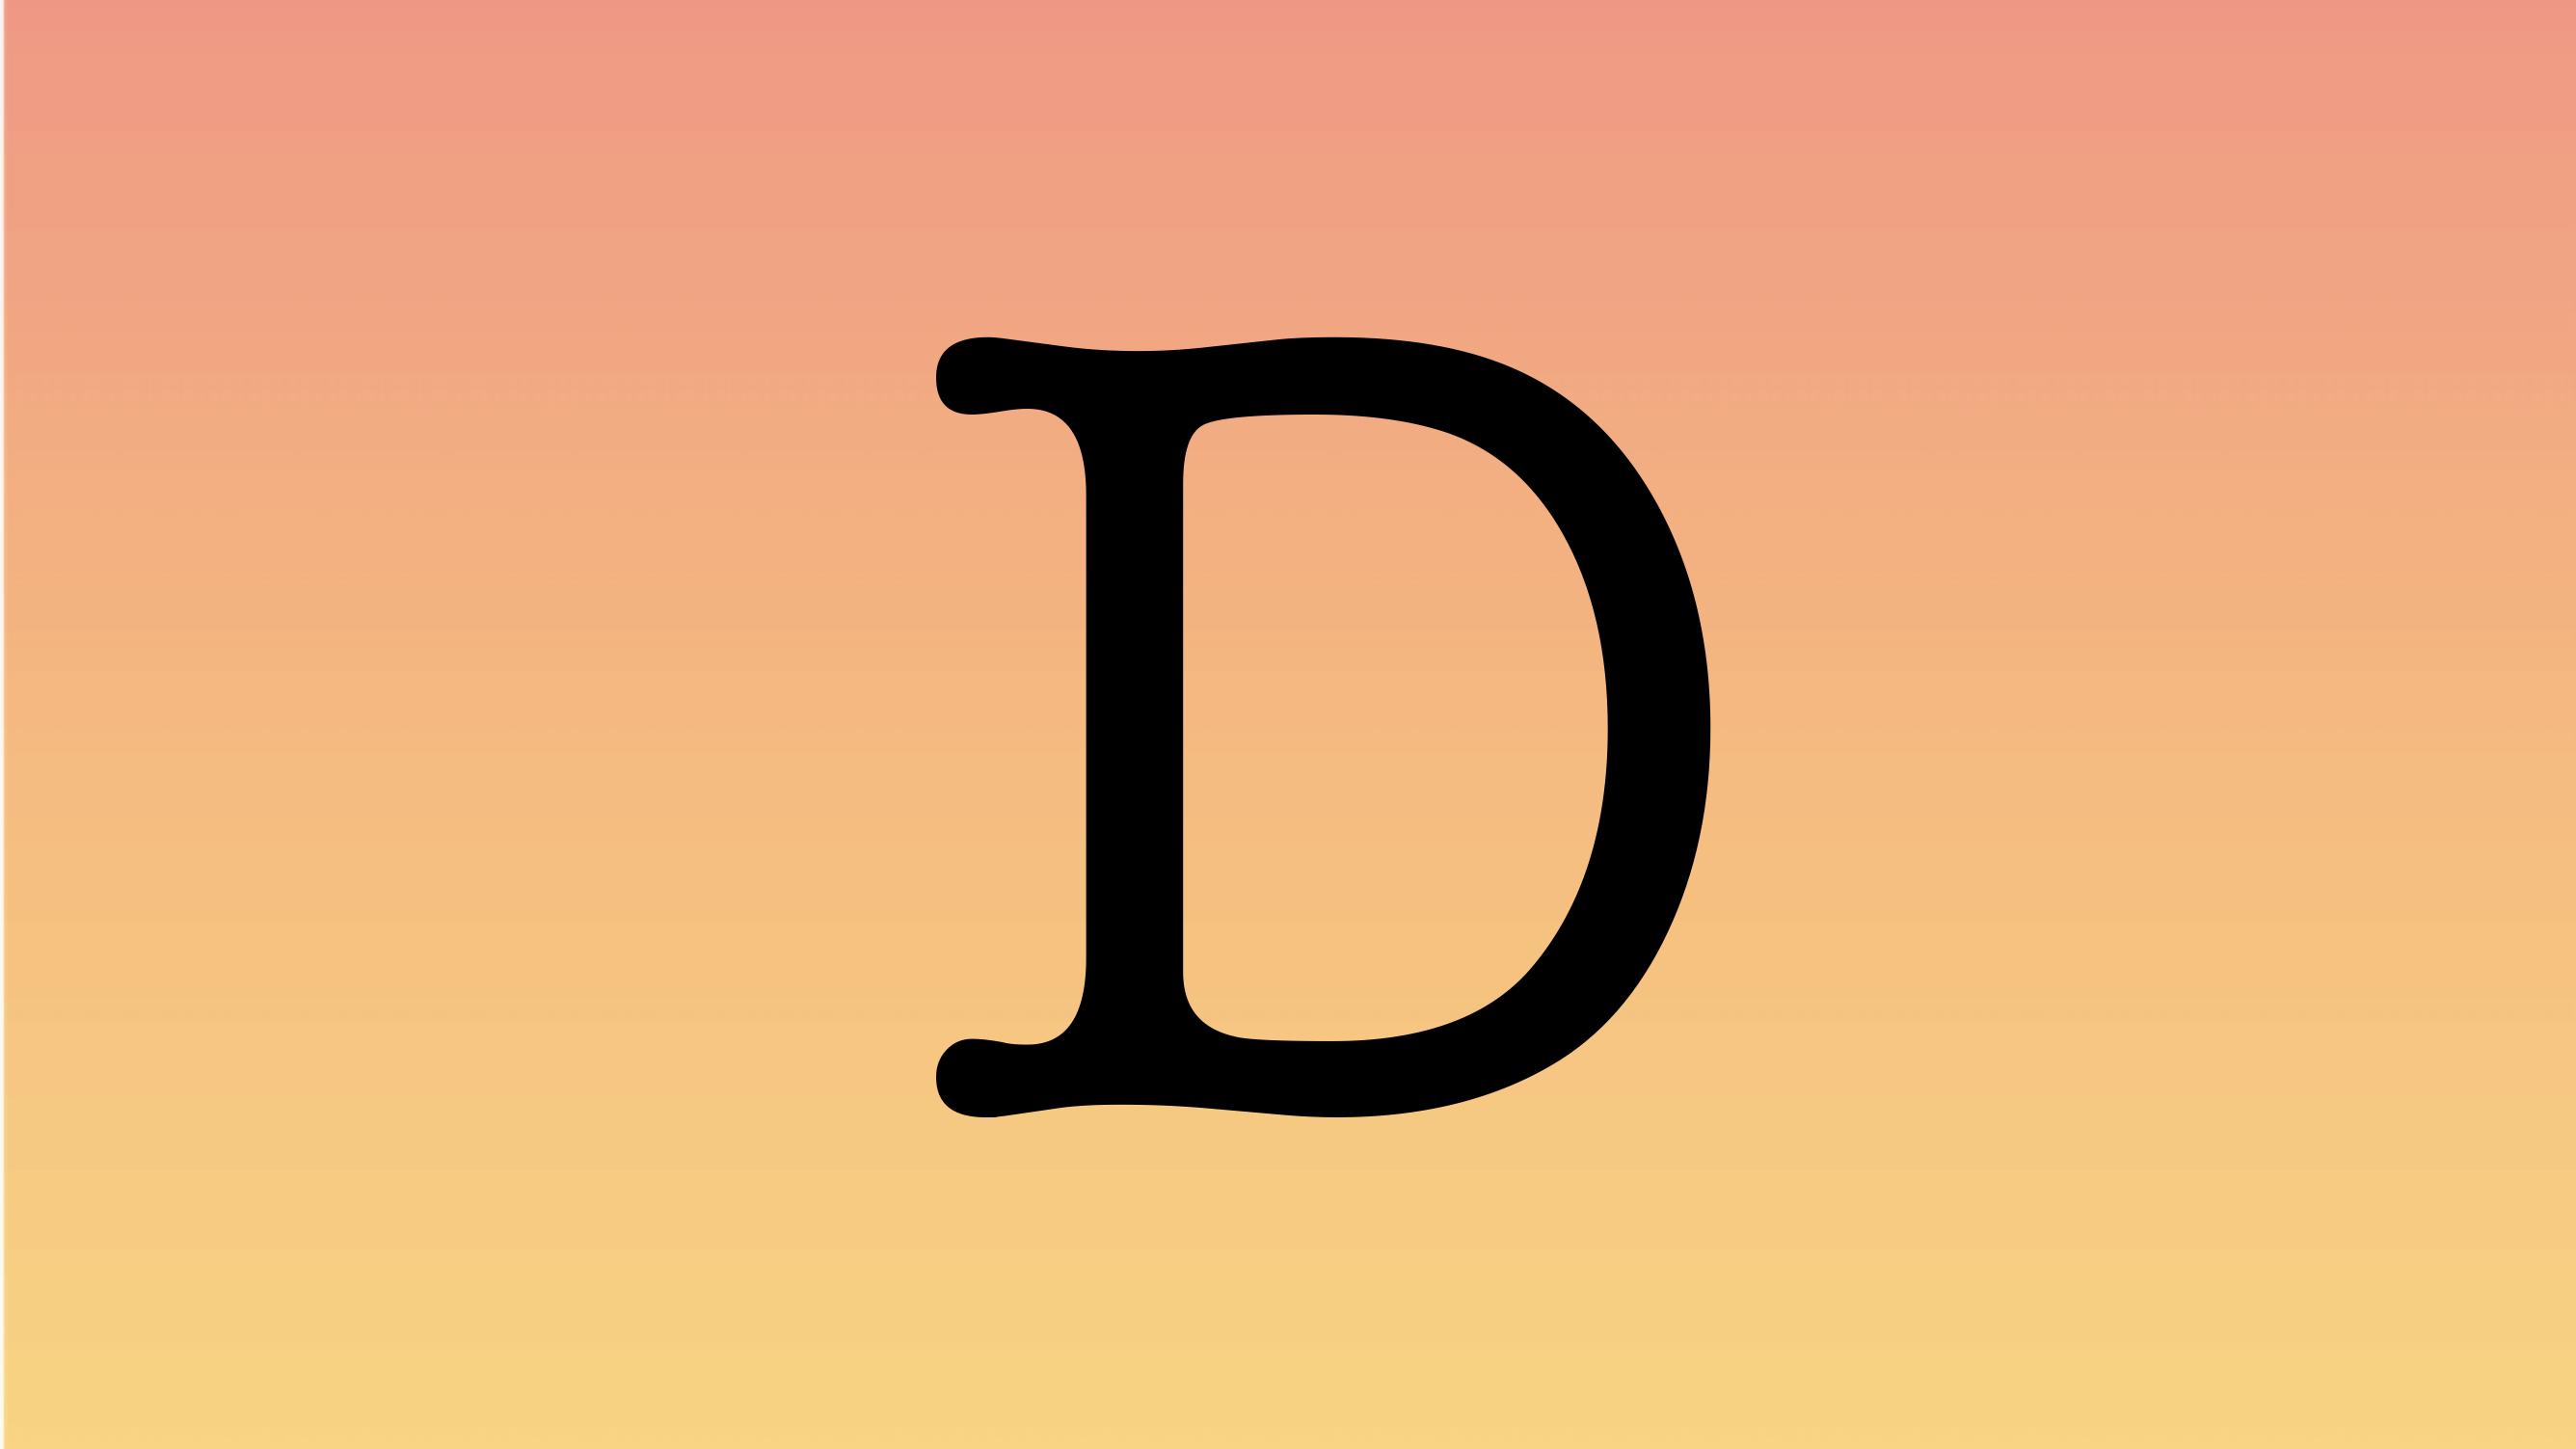 Dから始まる英語のサッカー用語【単語 & フレーズ】